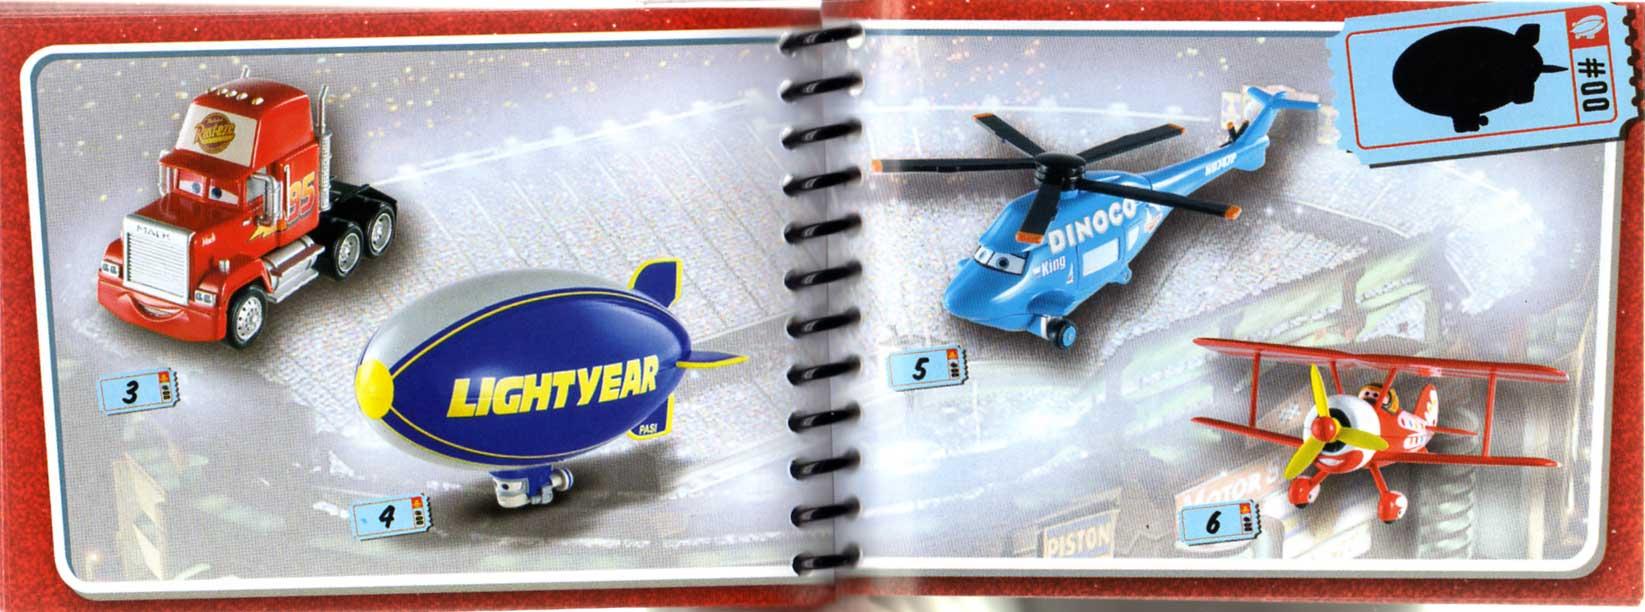 Catalogue Race O Rama page 74 - 75